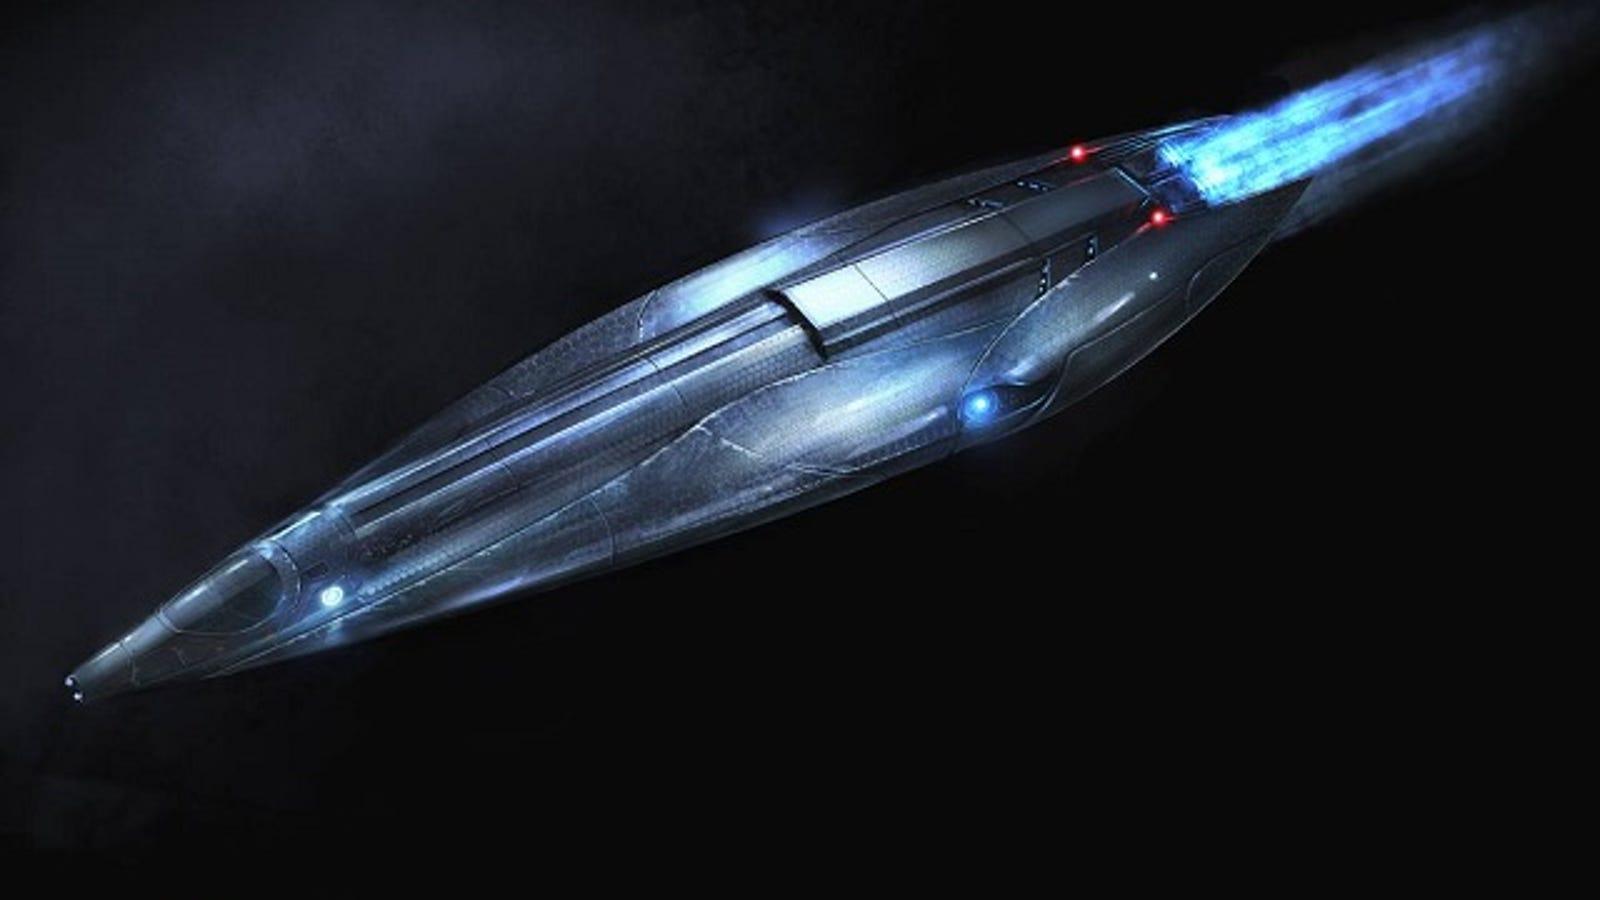 X Men Days Of Future Past Concept Art Shows The Future X Jet S Beauty